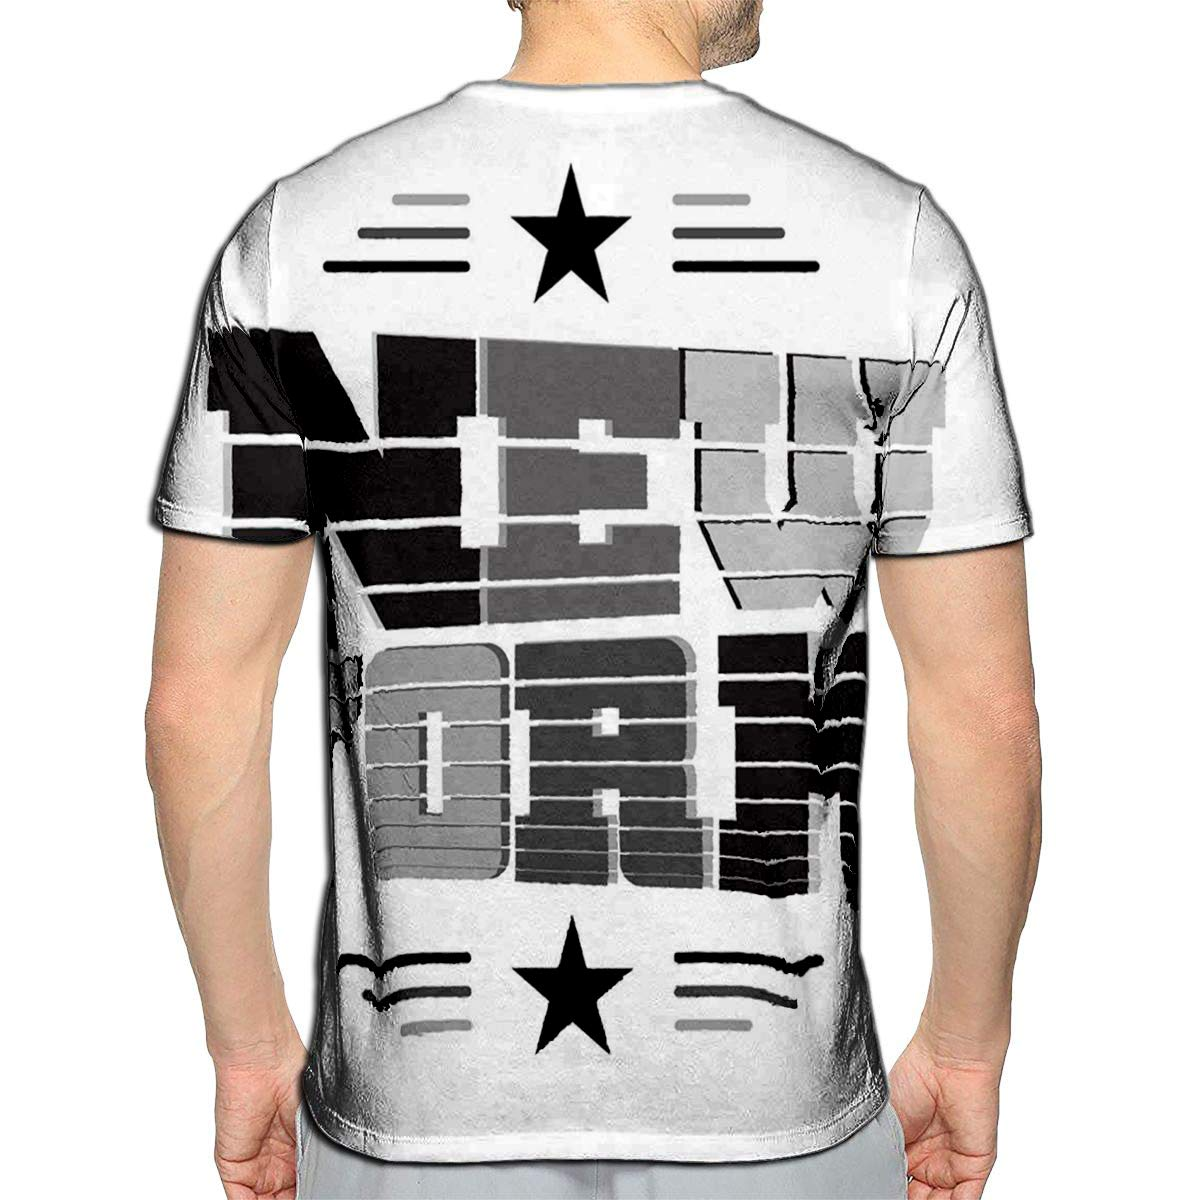 YILINGER 3D Printed T Shirts Brevity Casual Mens Hipster Top Tees